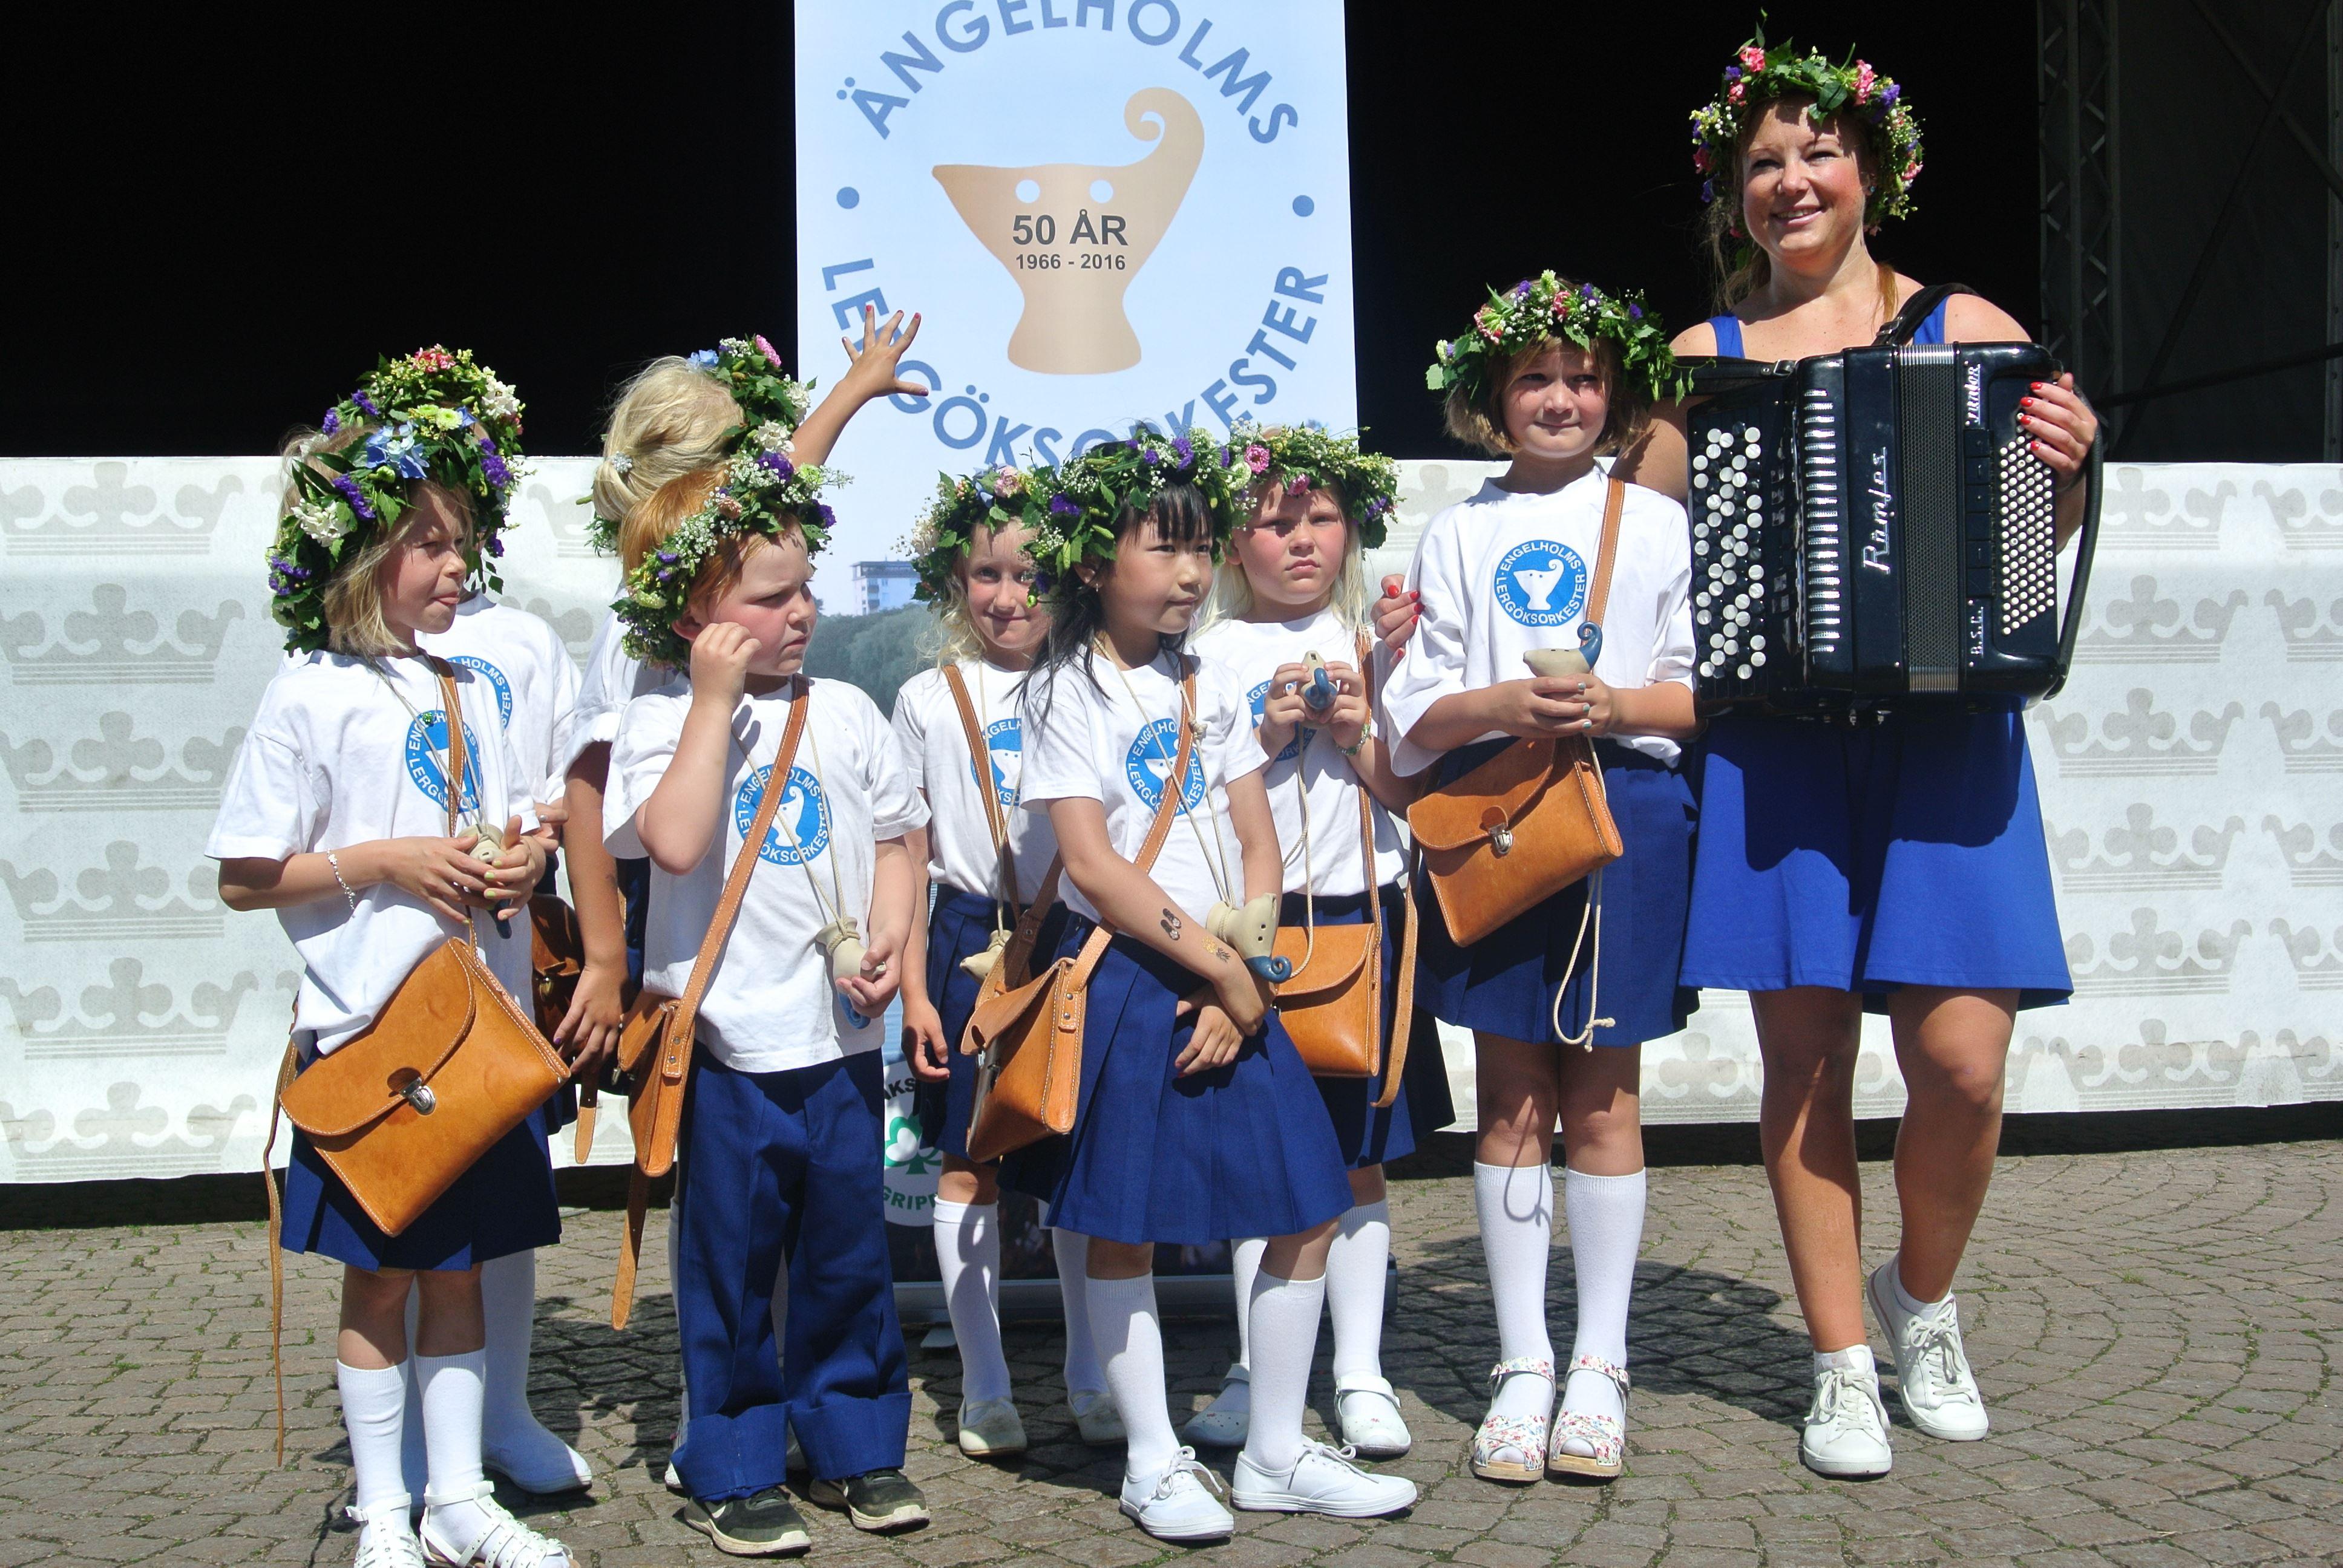 Konsert Lergöksorkestern Engelholm och Marching Band